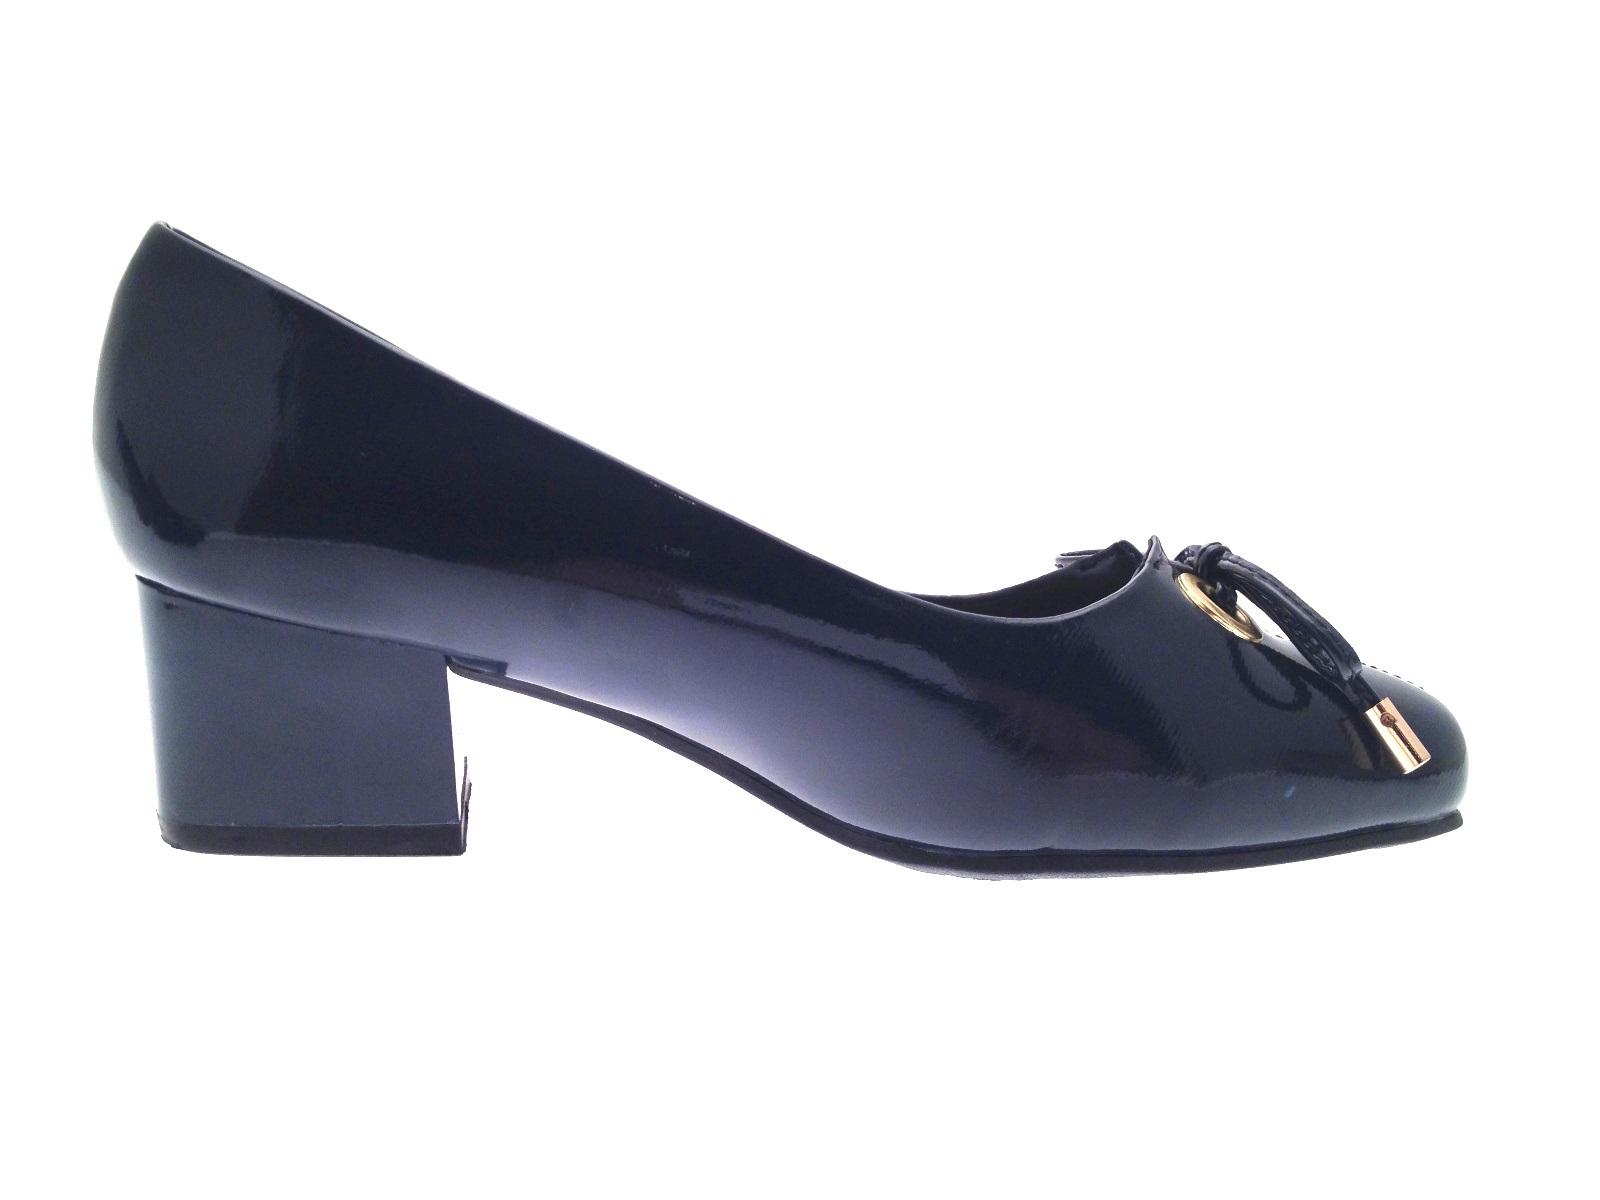 Ladies Wide Fit Court Shoes Uk